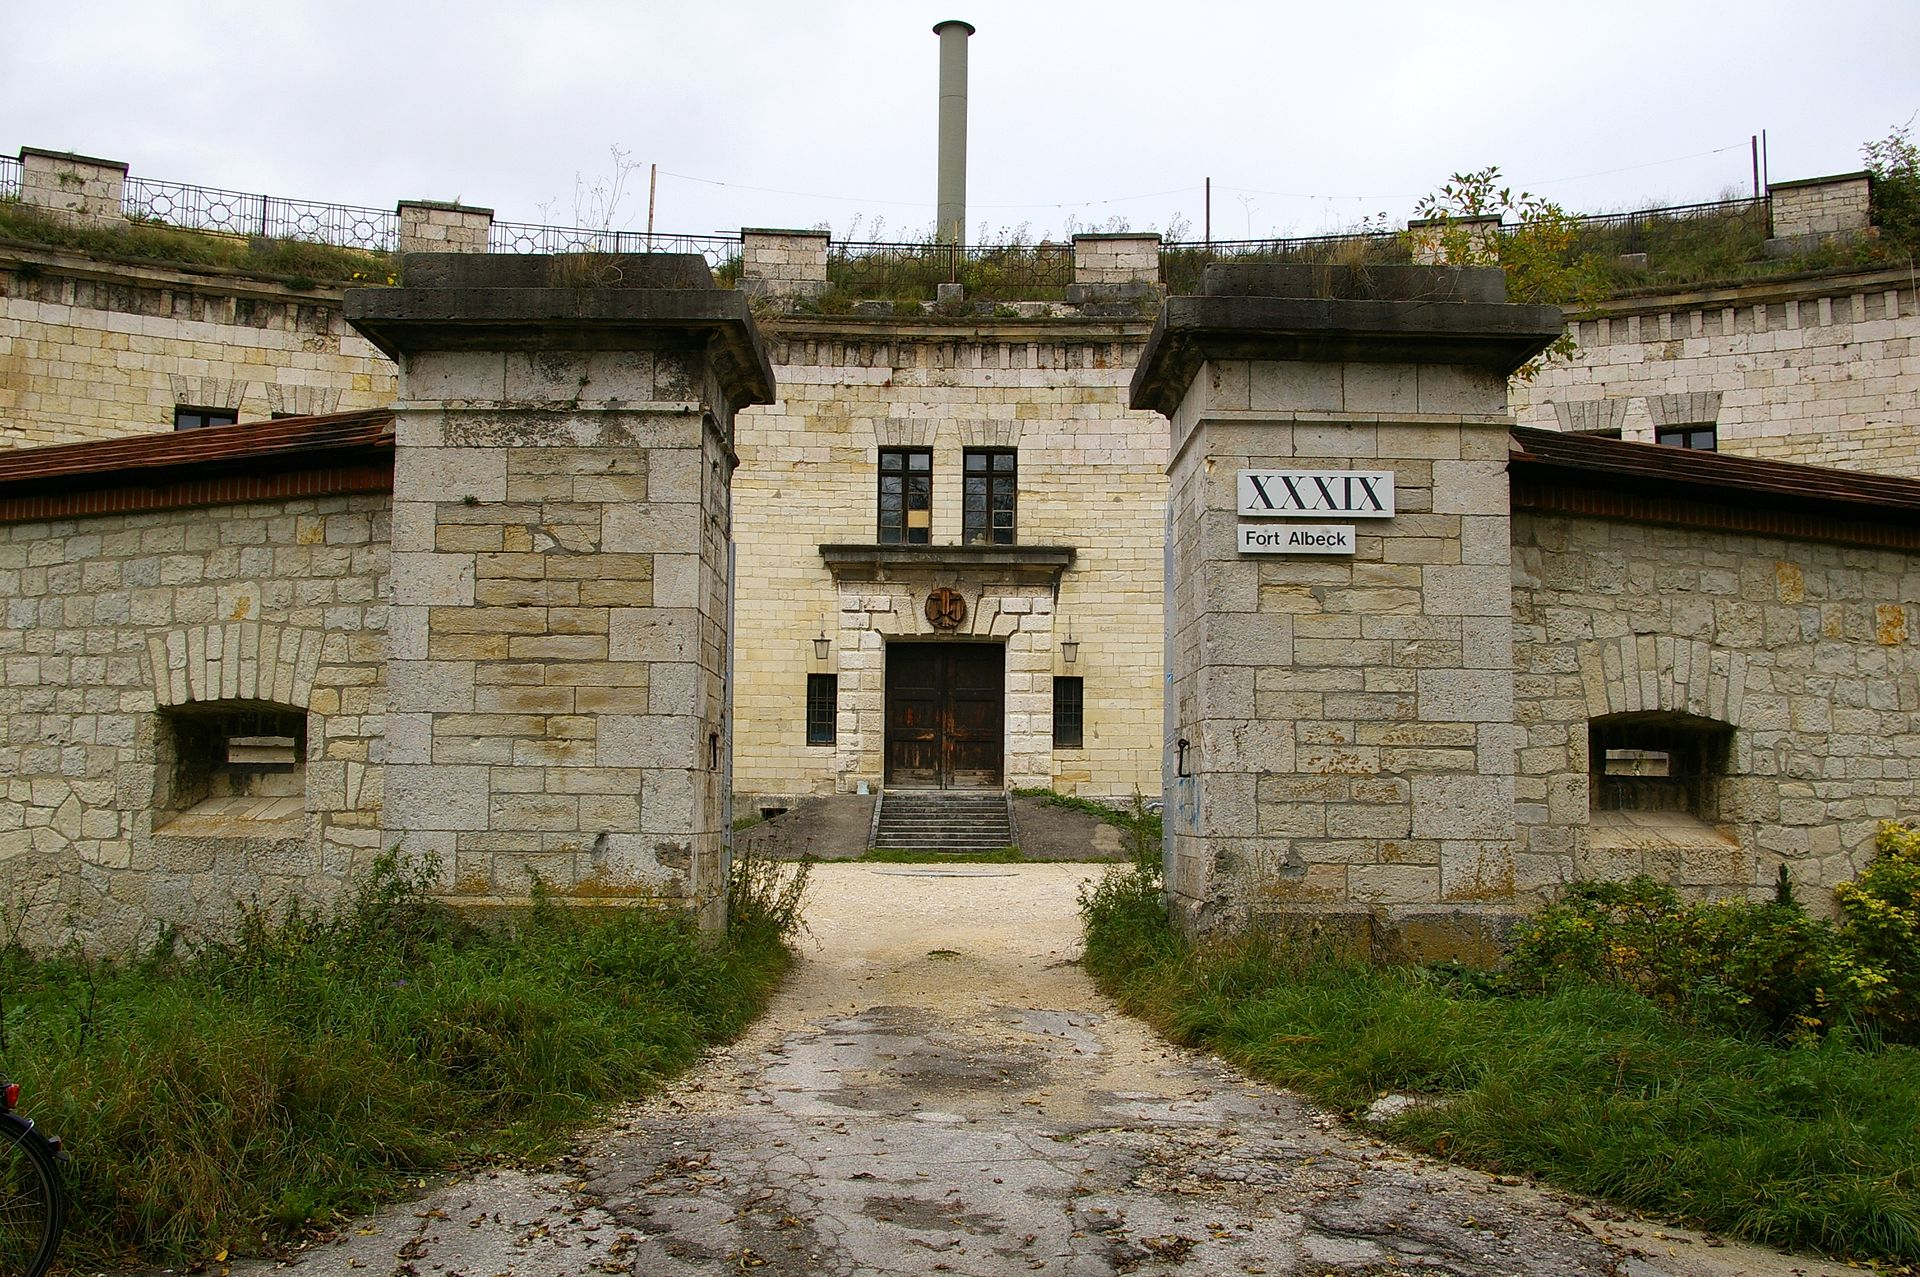 Fort_Albeck_Ulm_MikeAtari.jpg